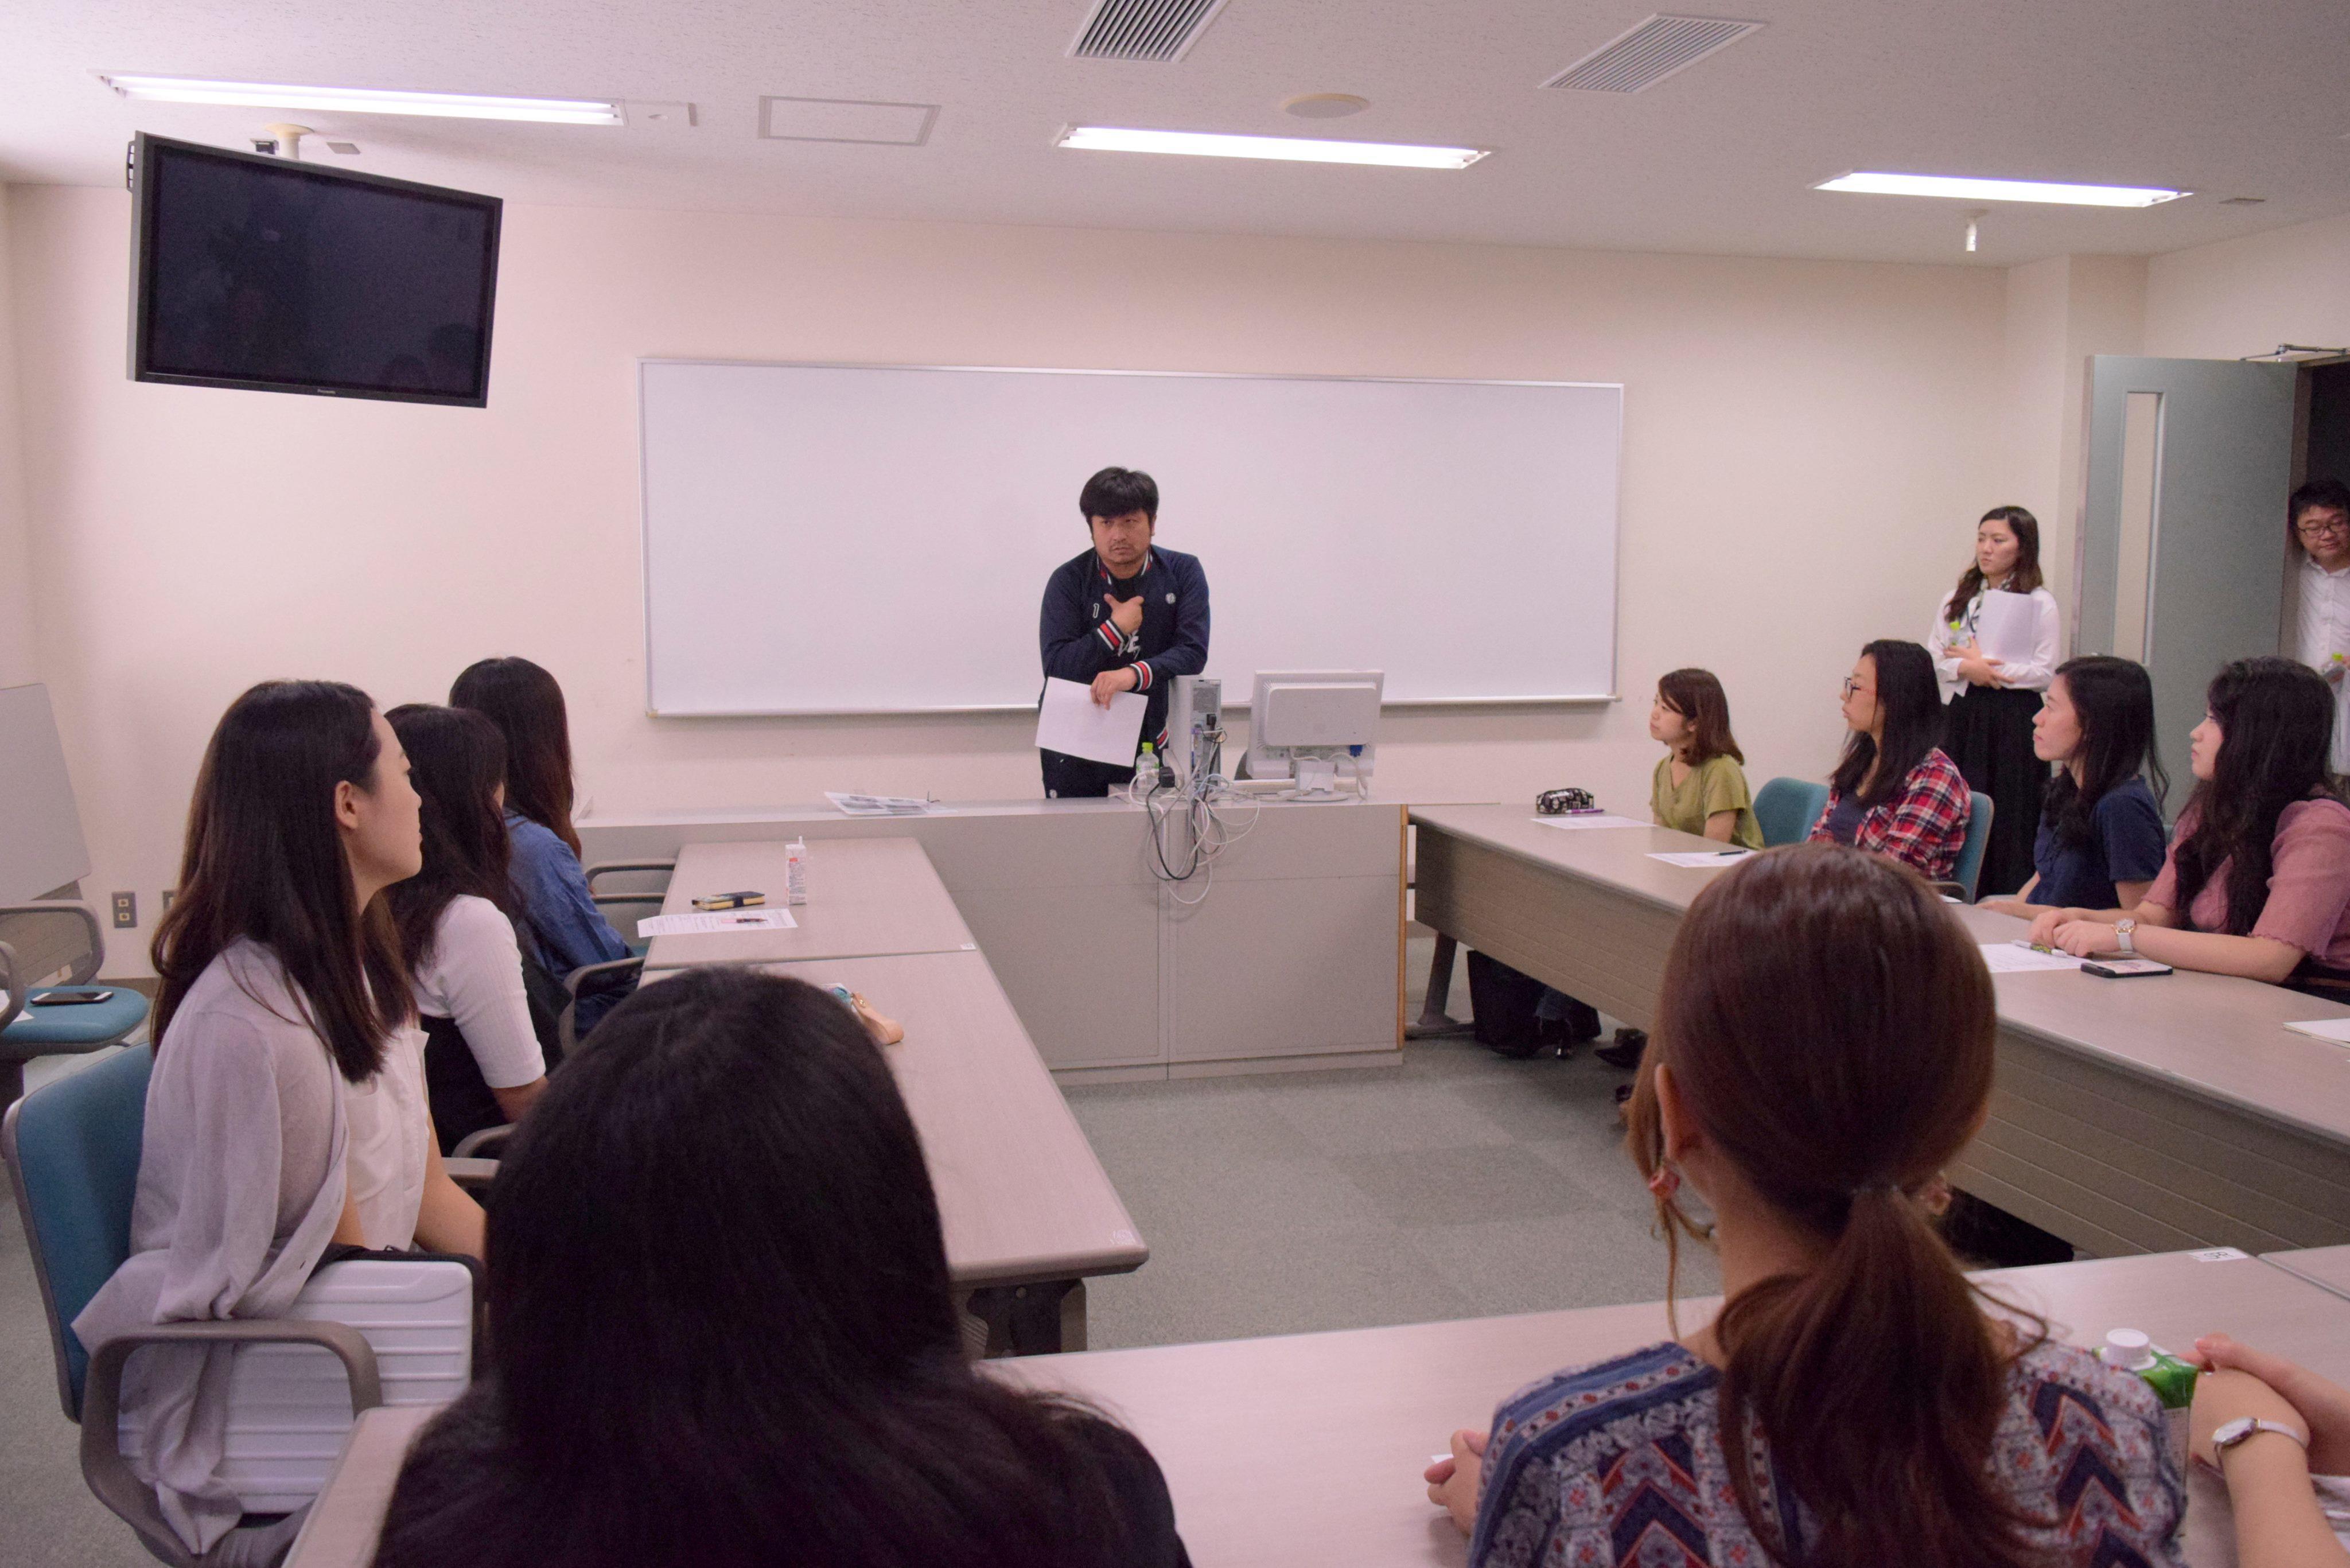 http://news.yoshimoto.co.jp/20170927182115-099b975f1592794ed290ca0b835ec8e965ca5846.jpg